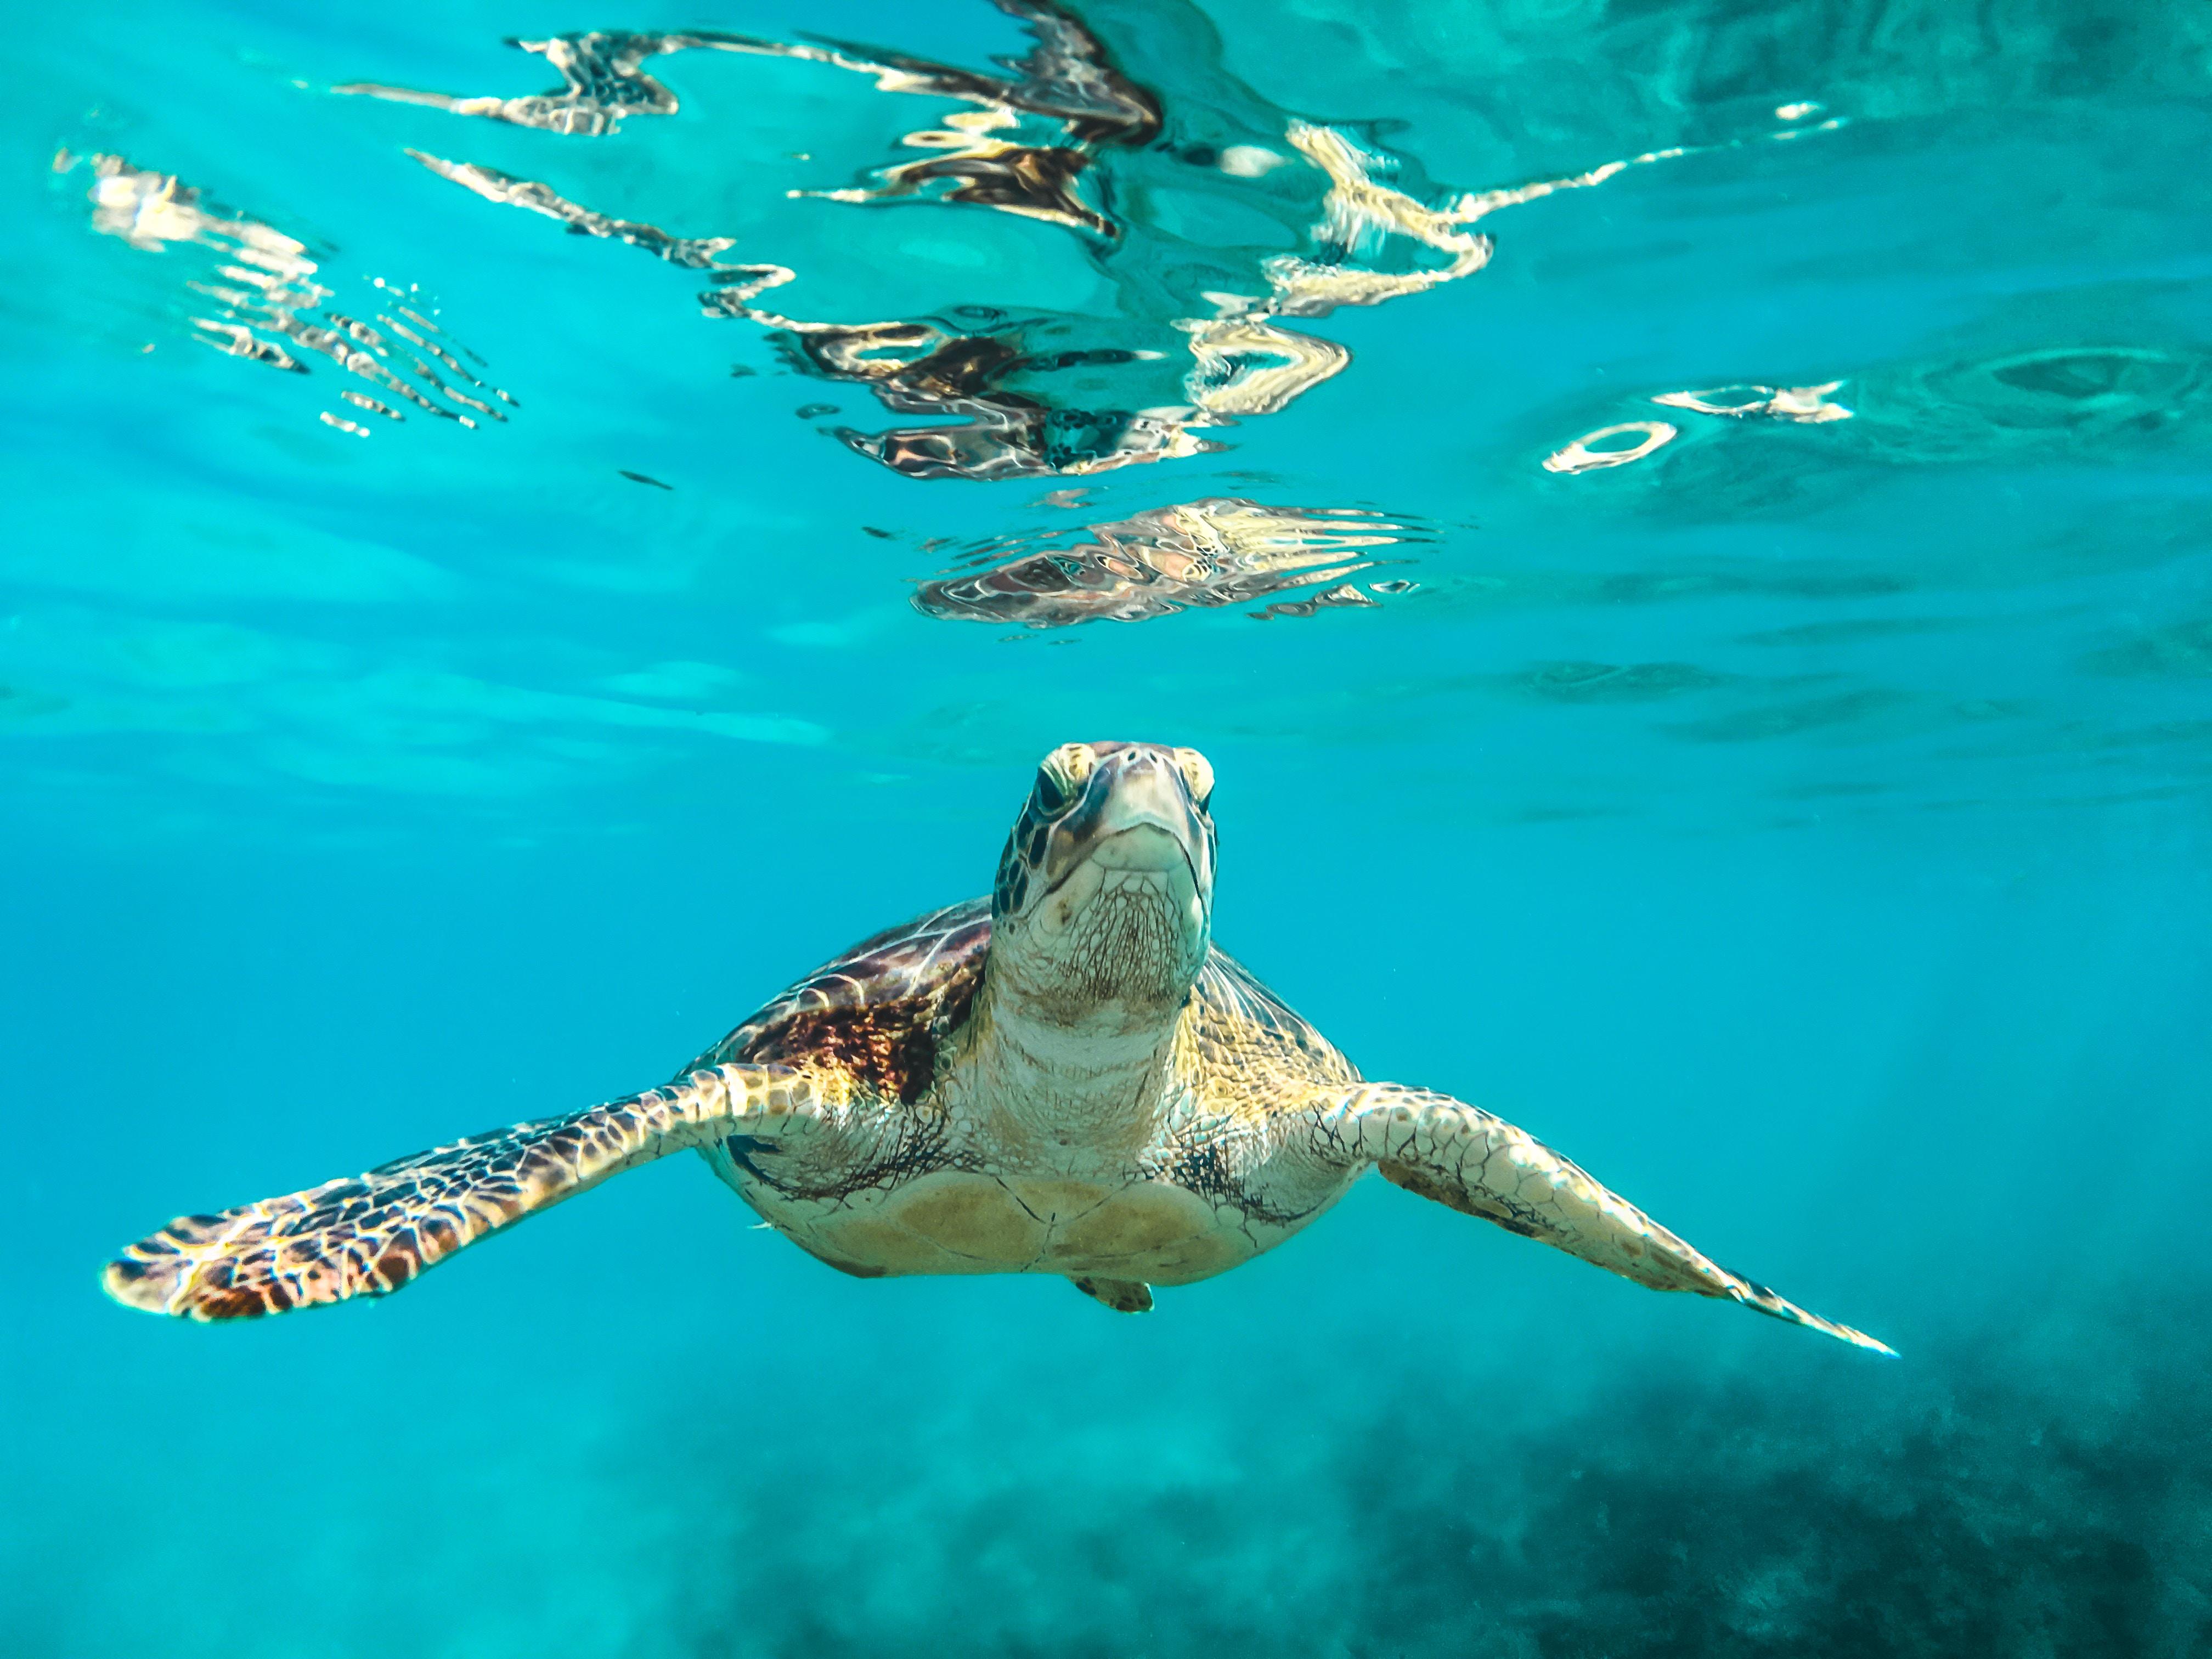 5308305 4032x3024 blue reflect swim aquatic turtle 4032x3024